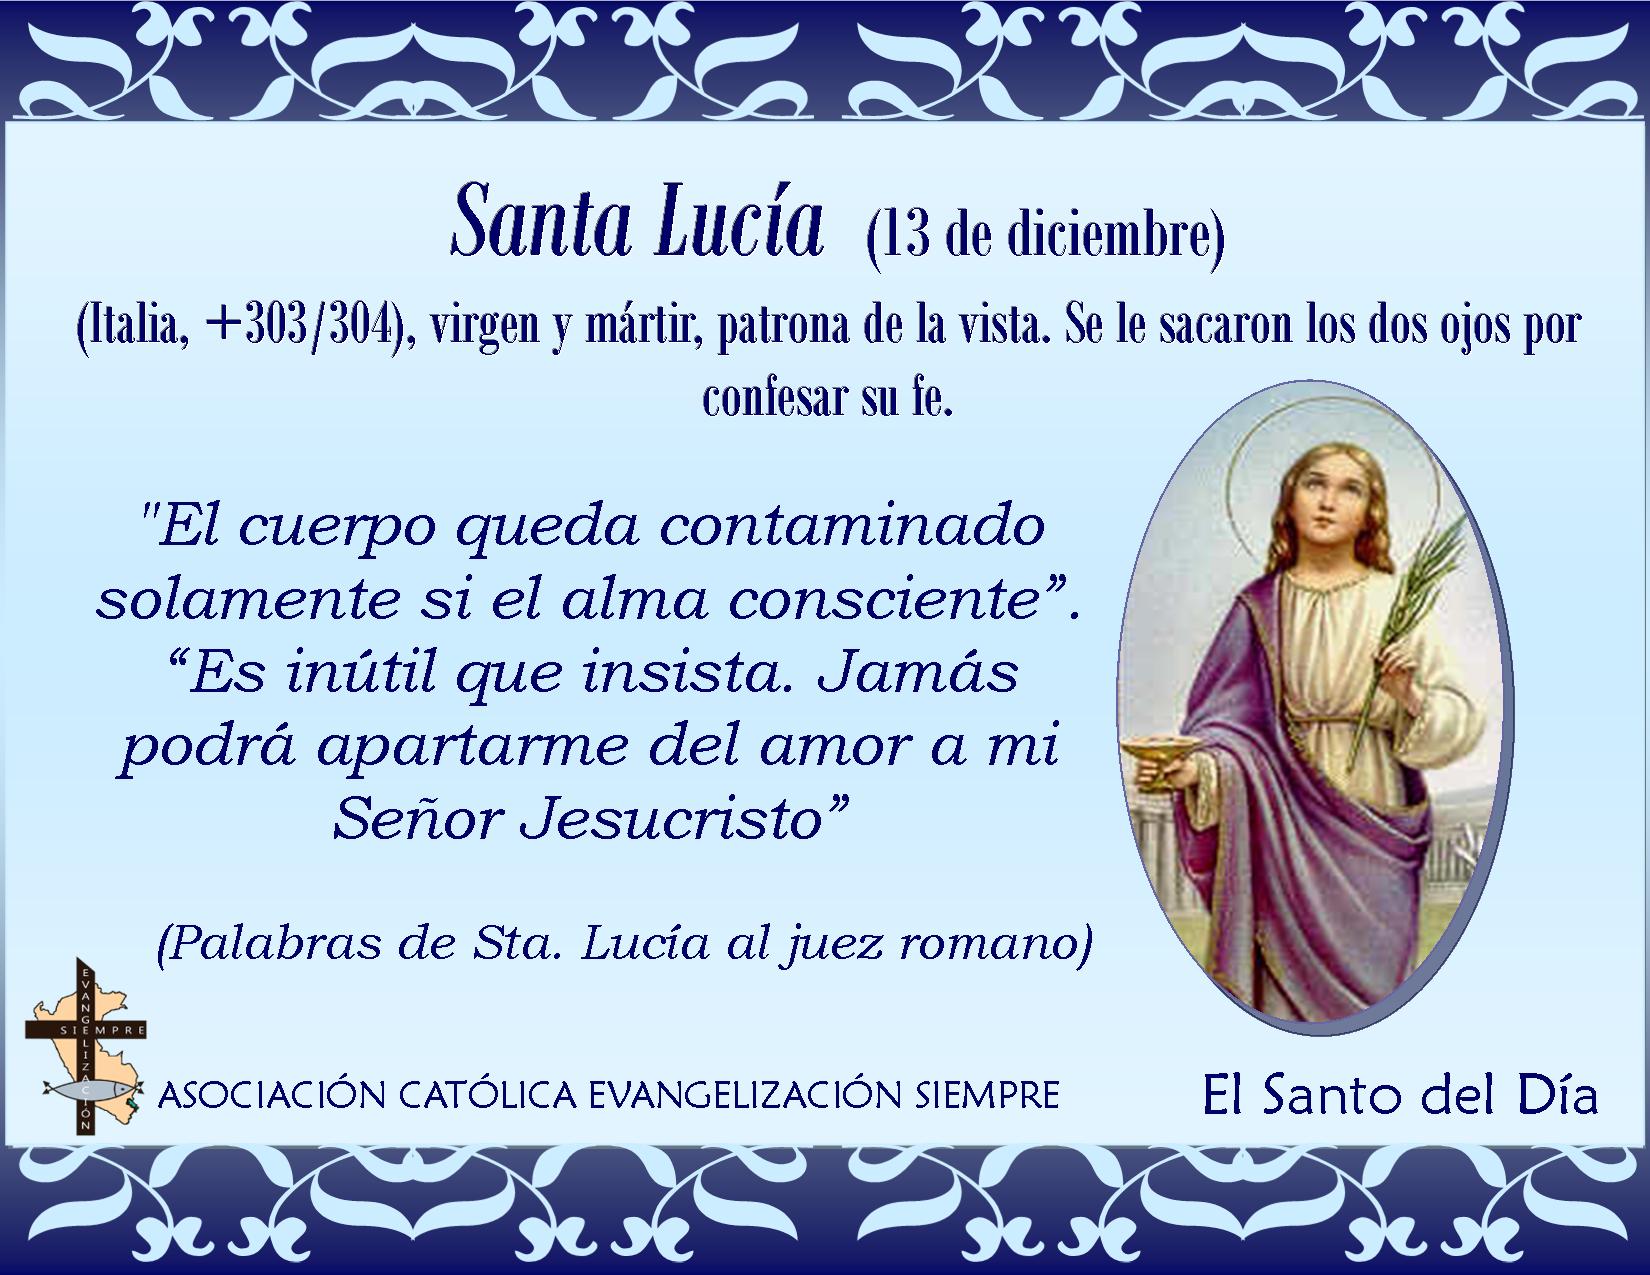 santo-del-dia-13-diciembre